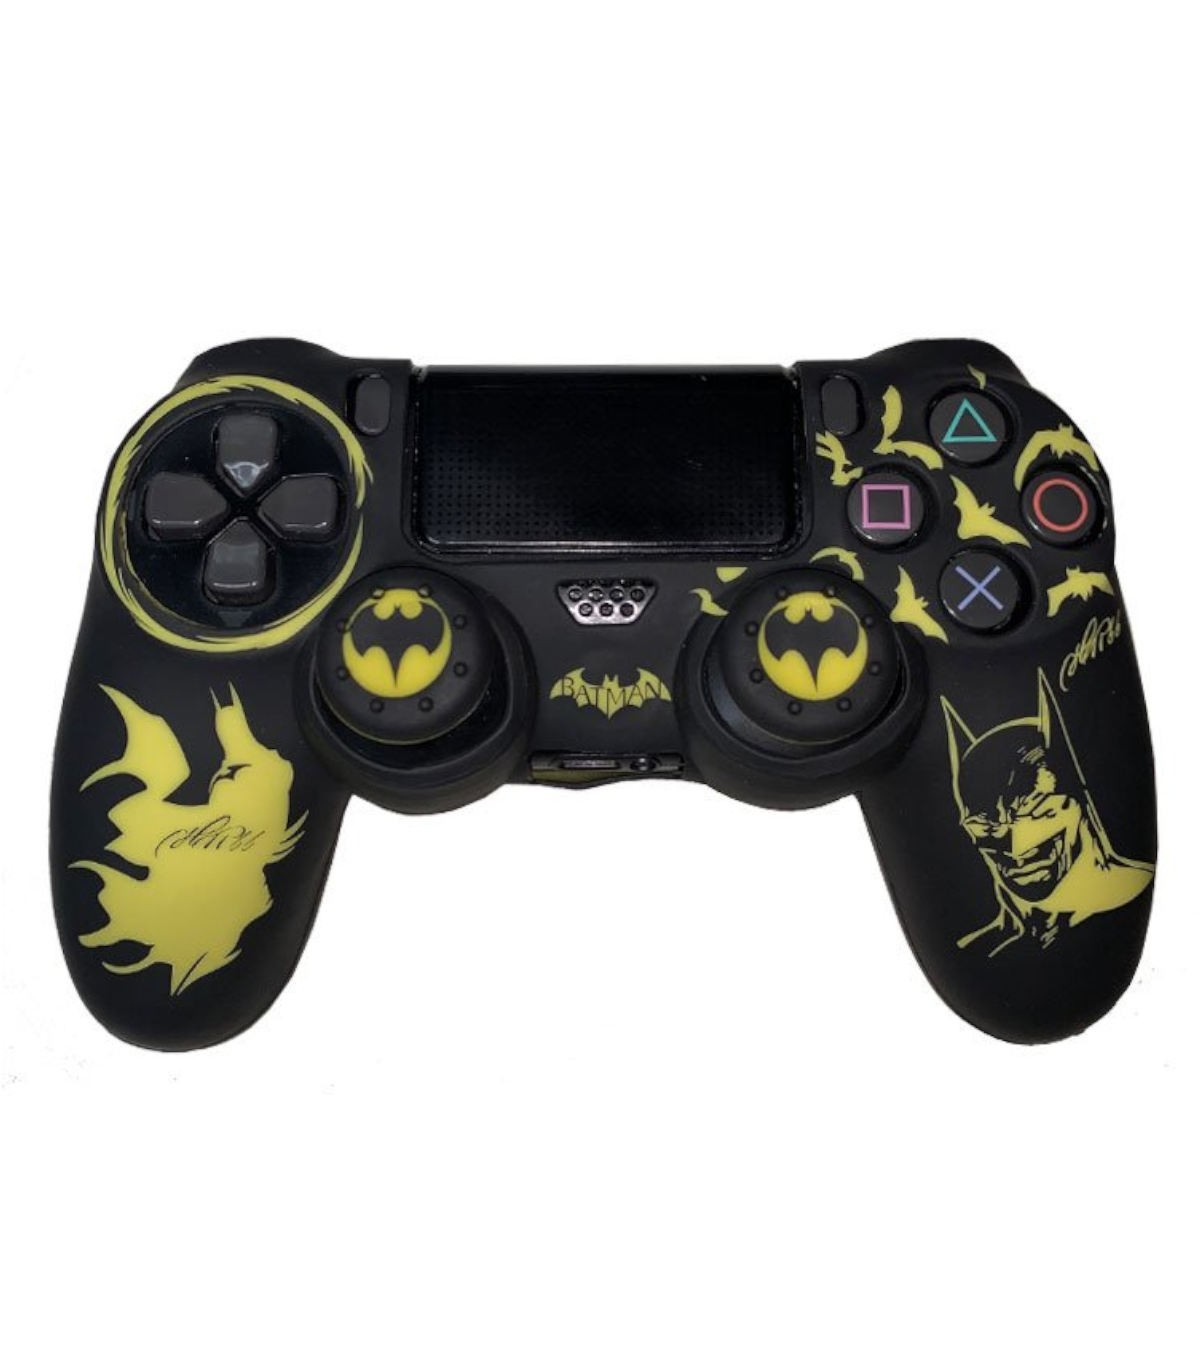 روکش دسته پلی استیشن 4 مدل Batman همراه با ۲ عدد محافظ آنالوگ